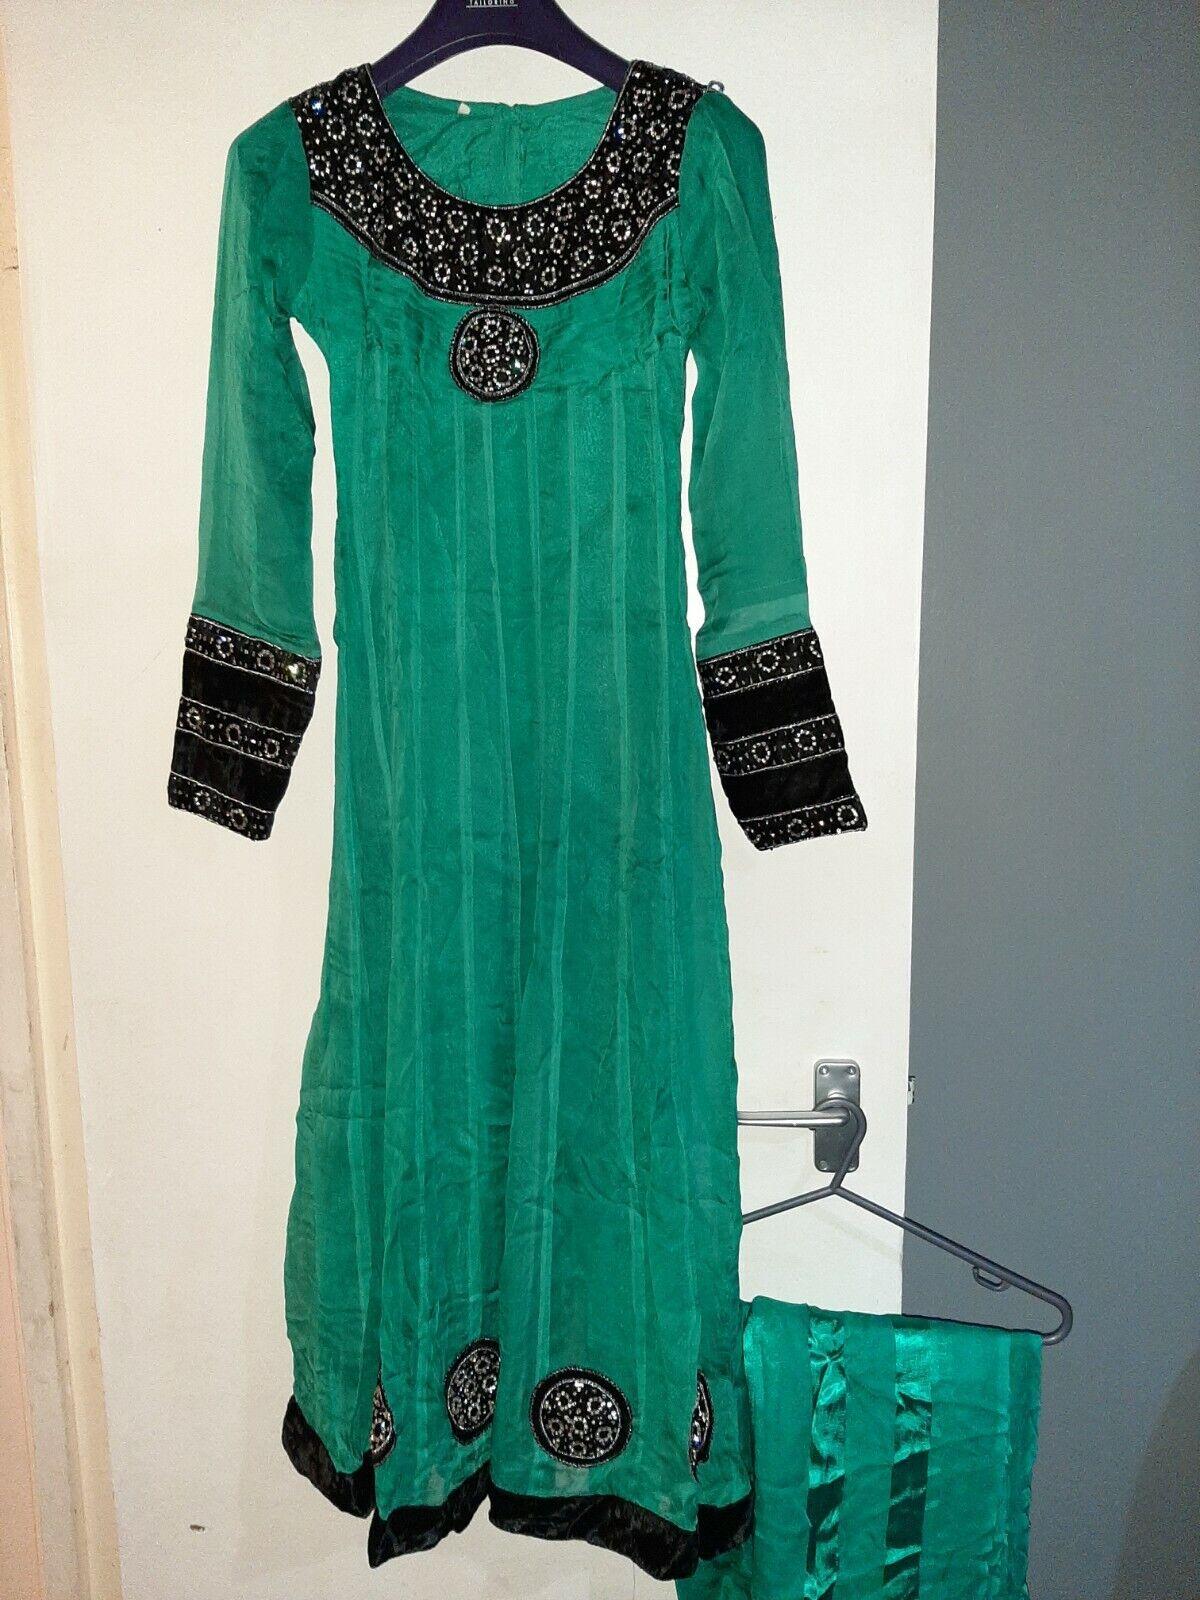 Pakistani Shalwar Kameez In Aqua & Black Size S VGC